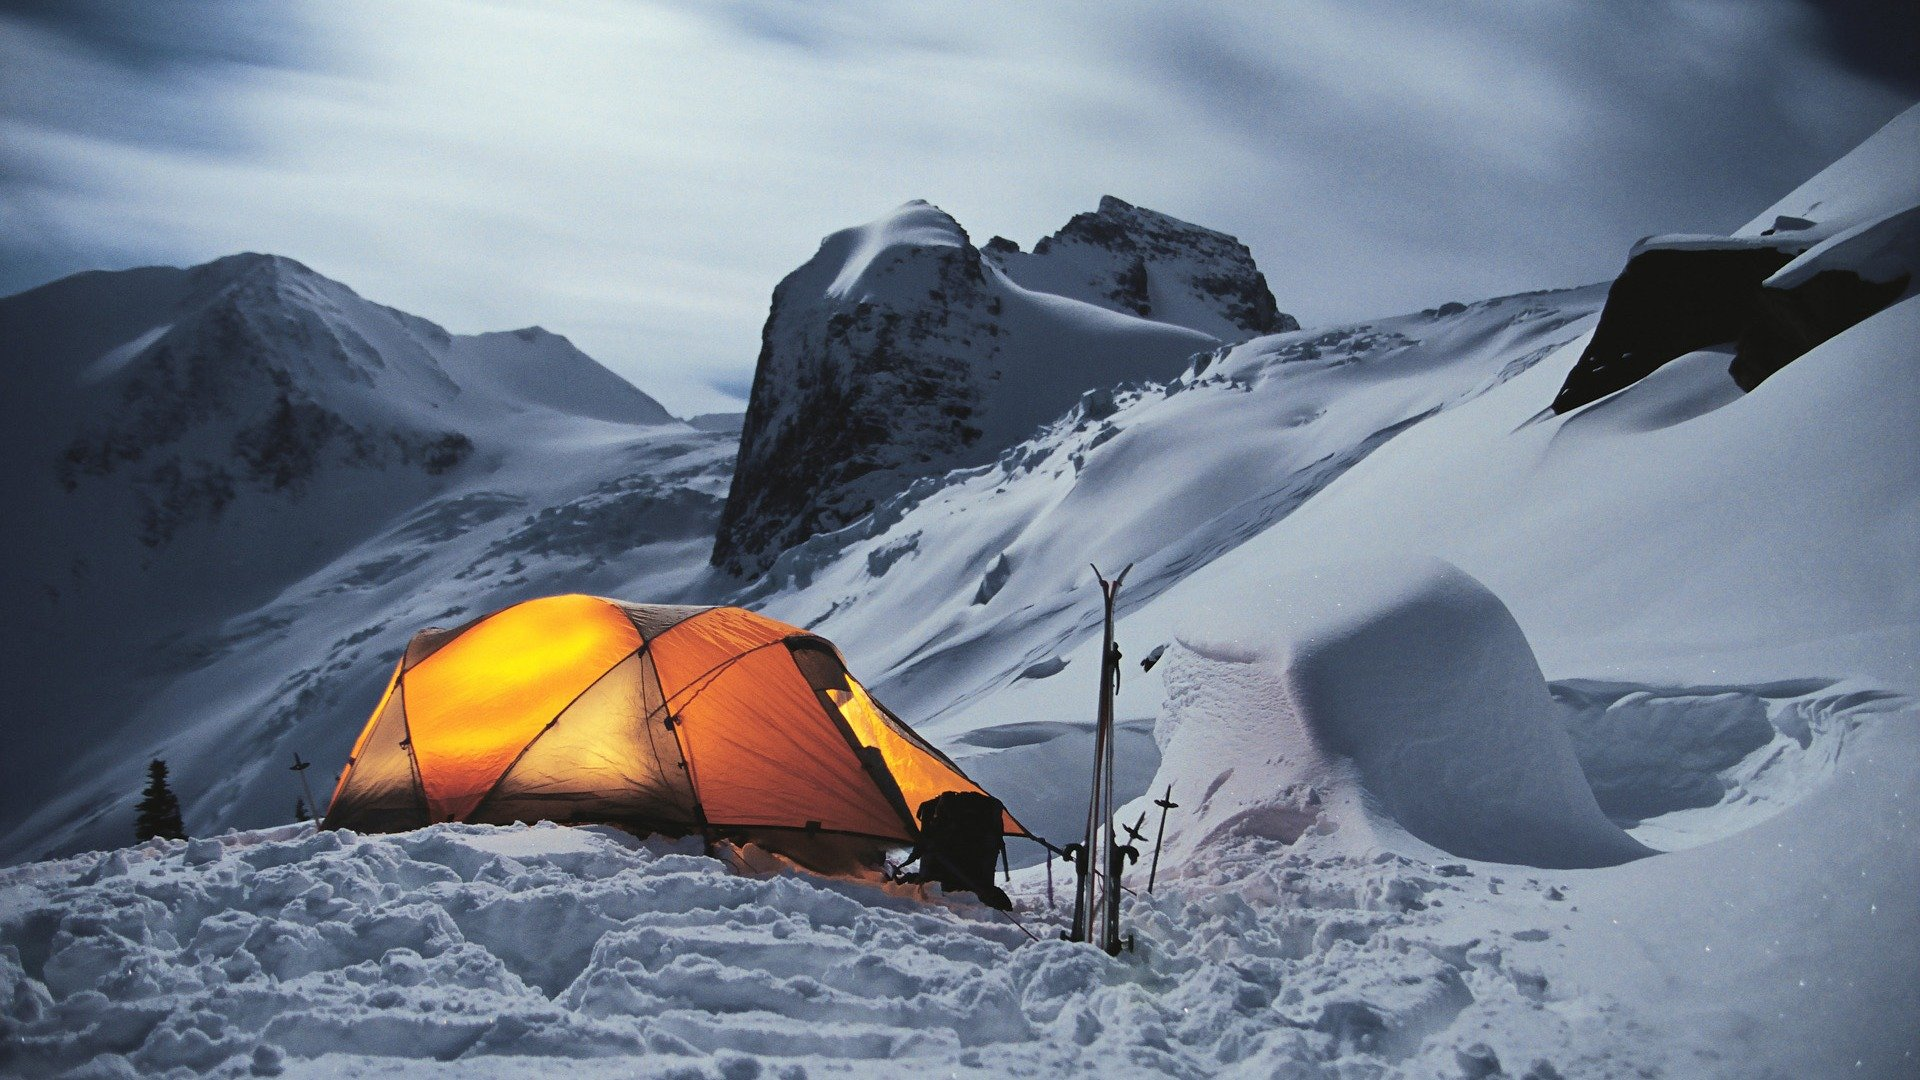 Winter Camp Windows 10 HD Wallpaper   1920x1080 wallpaper download 1920x1080